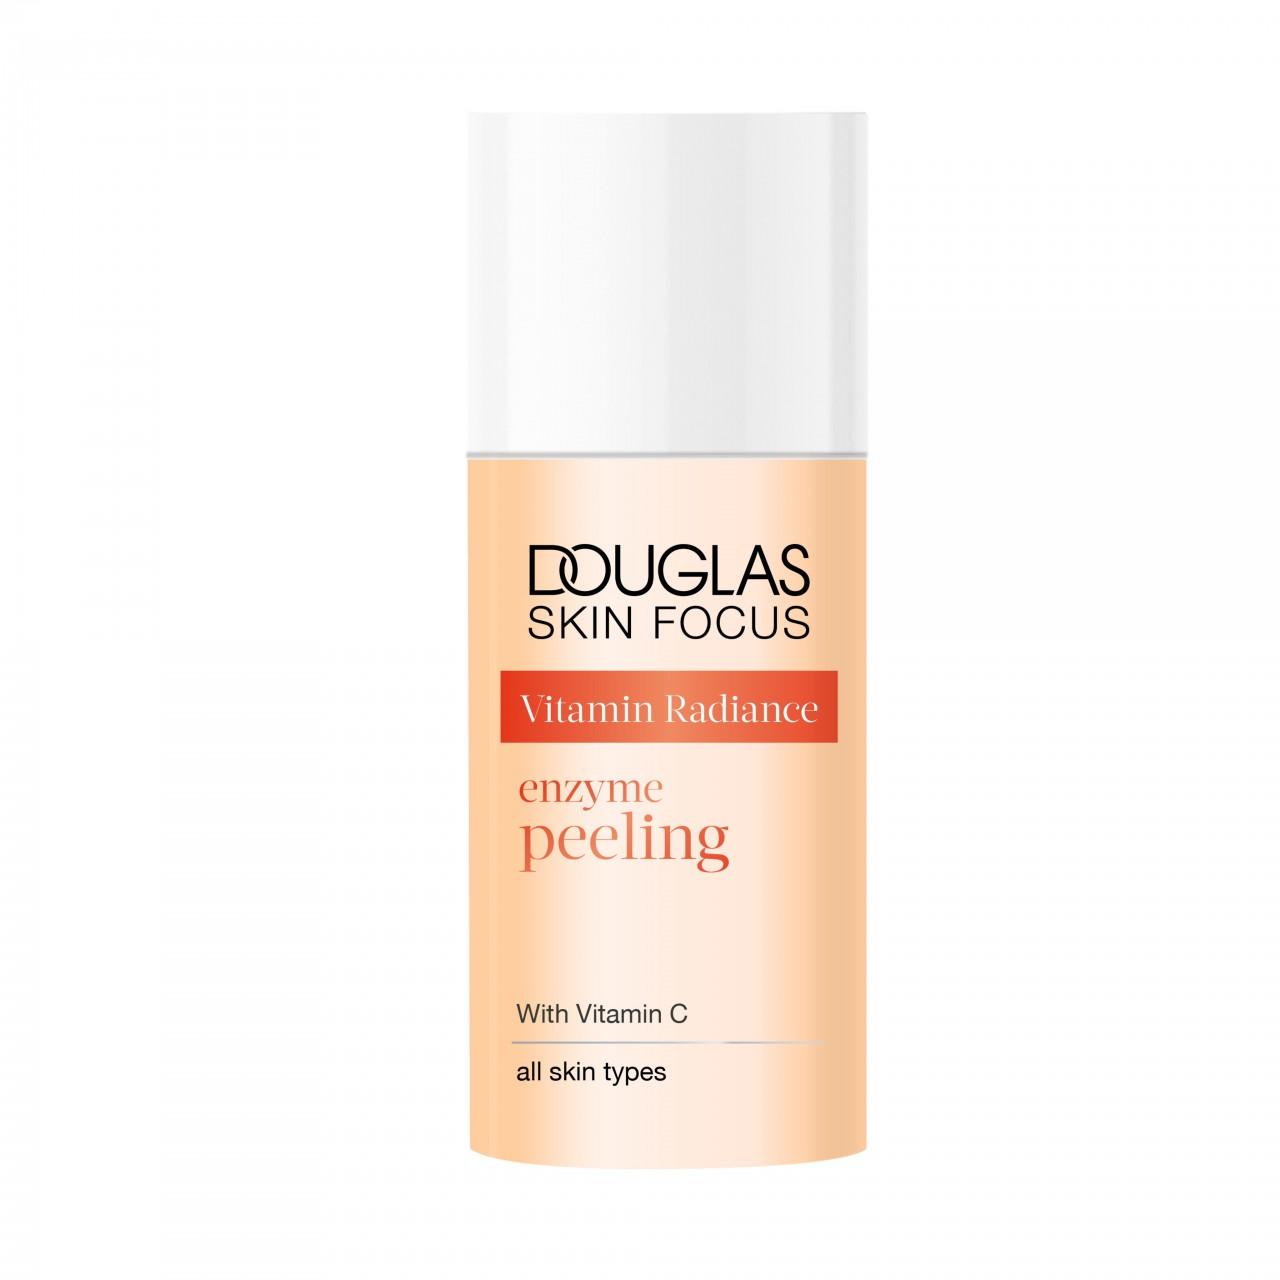 Douglas Focus Enzyme Peeling